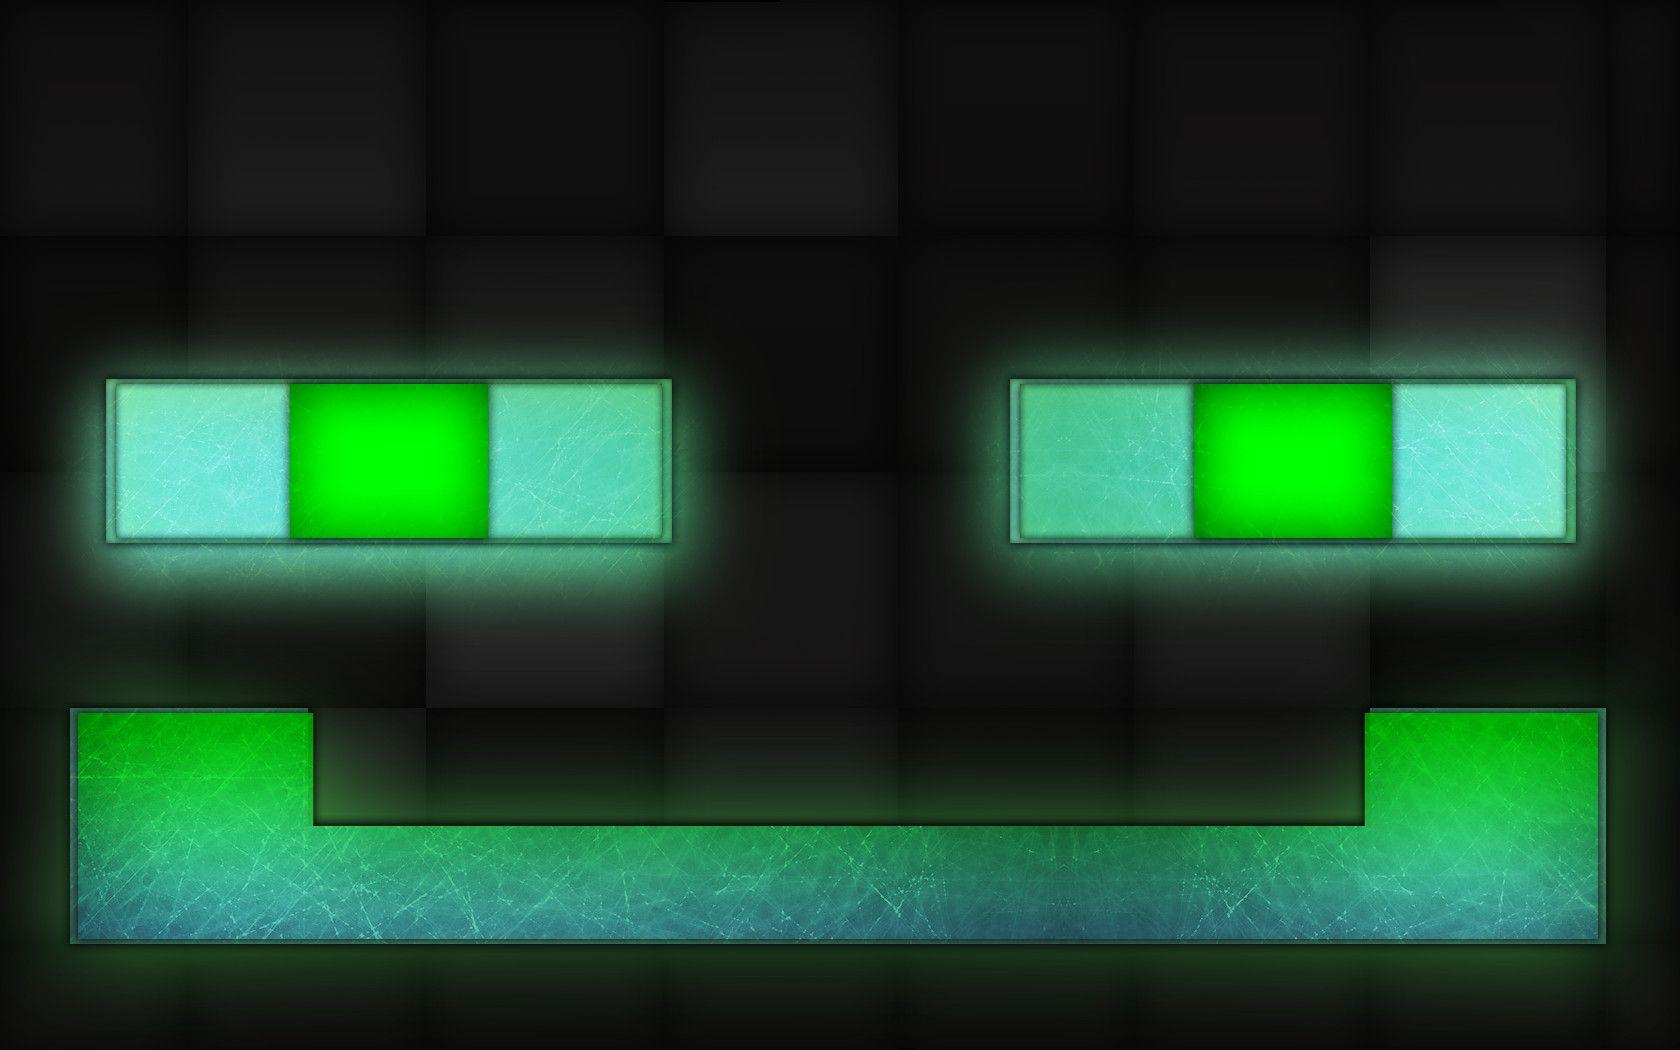 Popular Wallpaper Minecraft Enderman - 240a19293b347aa9b7bce515c7829a49  Pic_45963.jpg